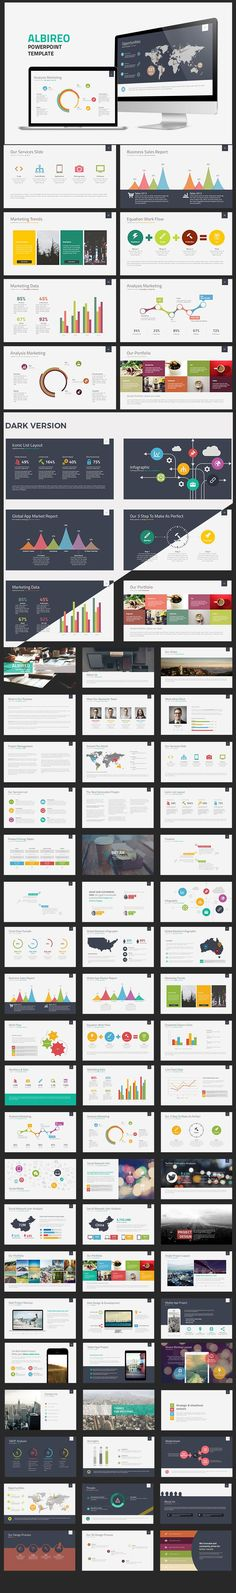 Satellite PowerPoint Template Technology PowerPoint Template - jeopardy powerpoint template